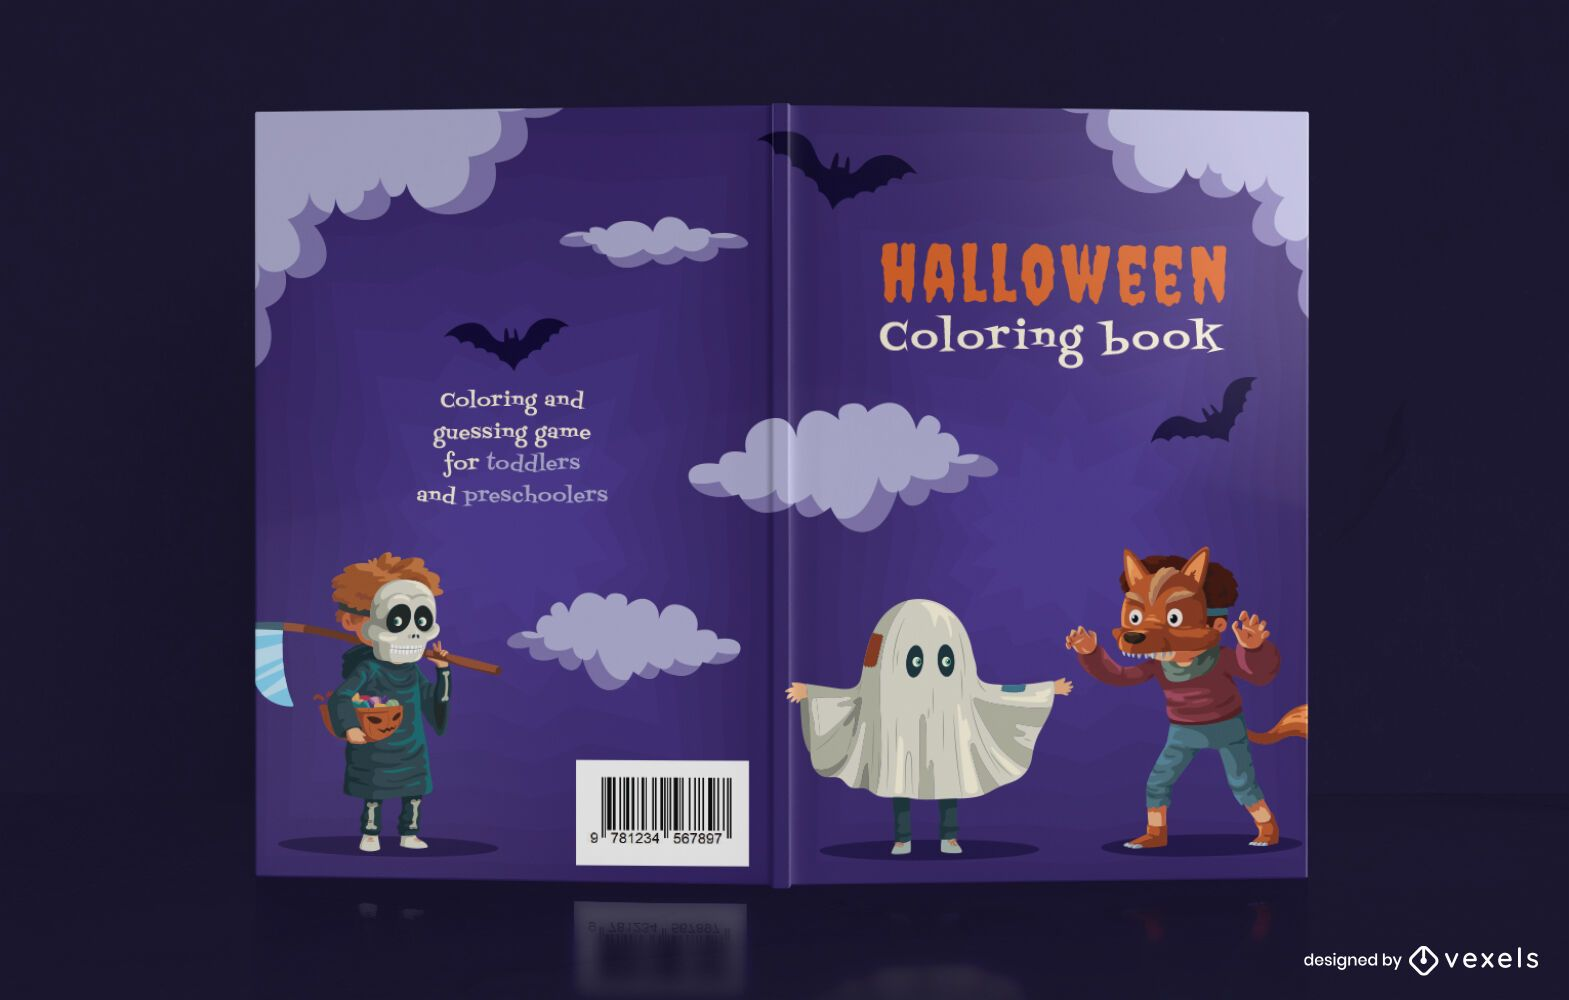 Halloween Coloring Book Cover Design